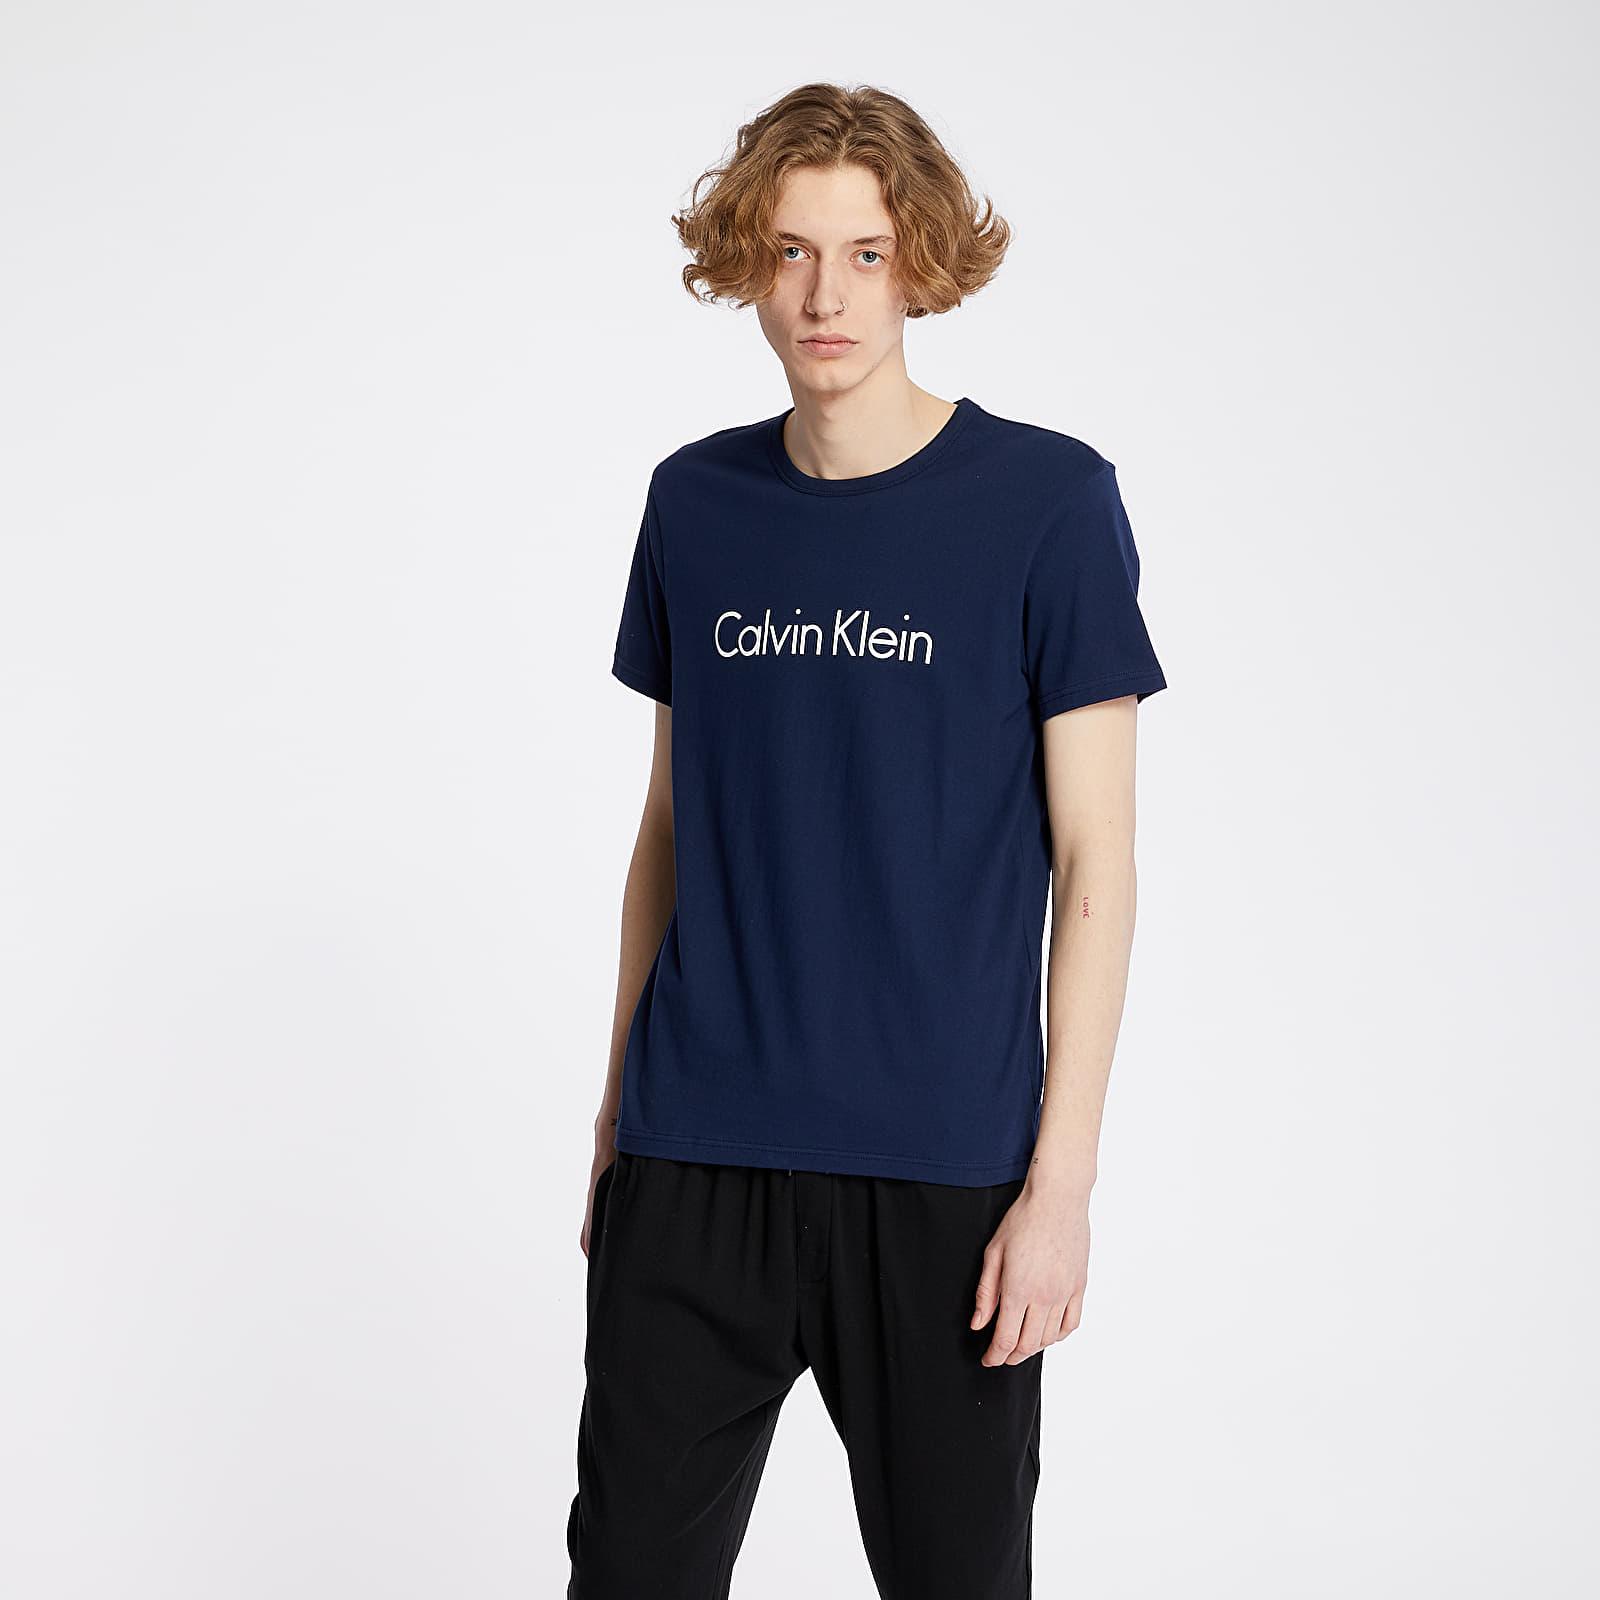 Calvin Klein Graphic Tee